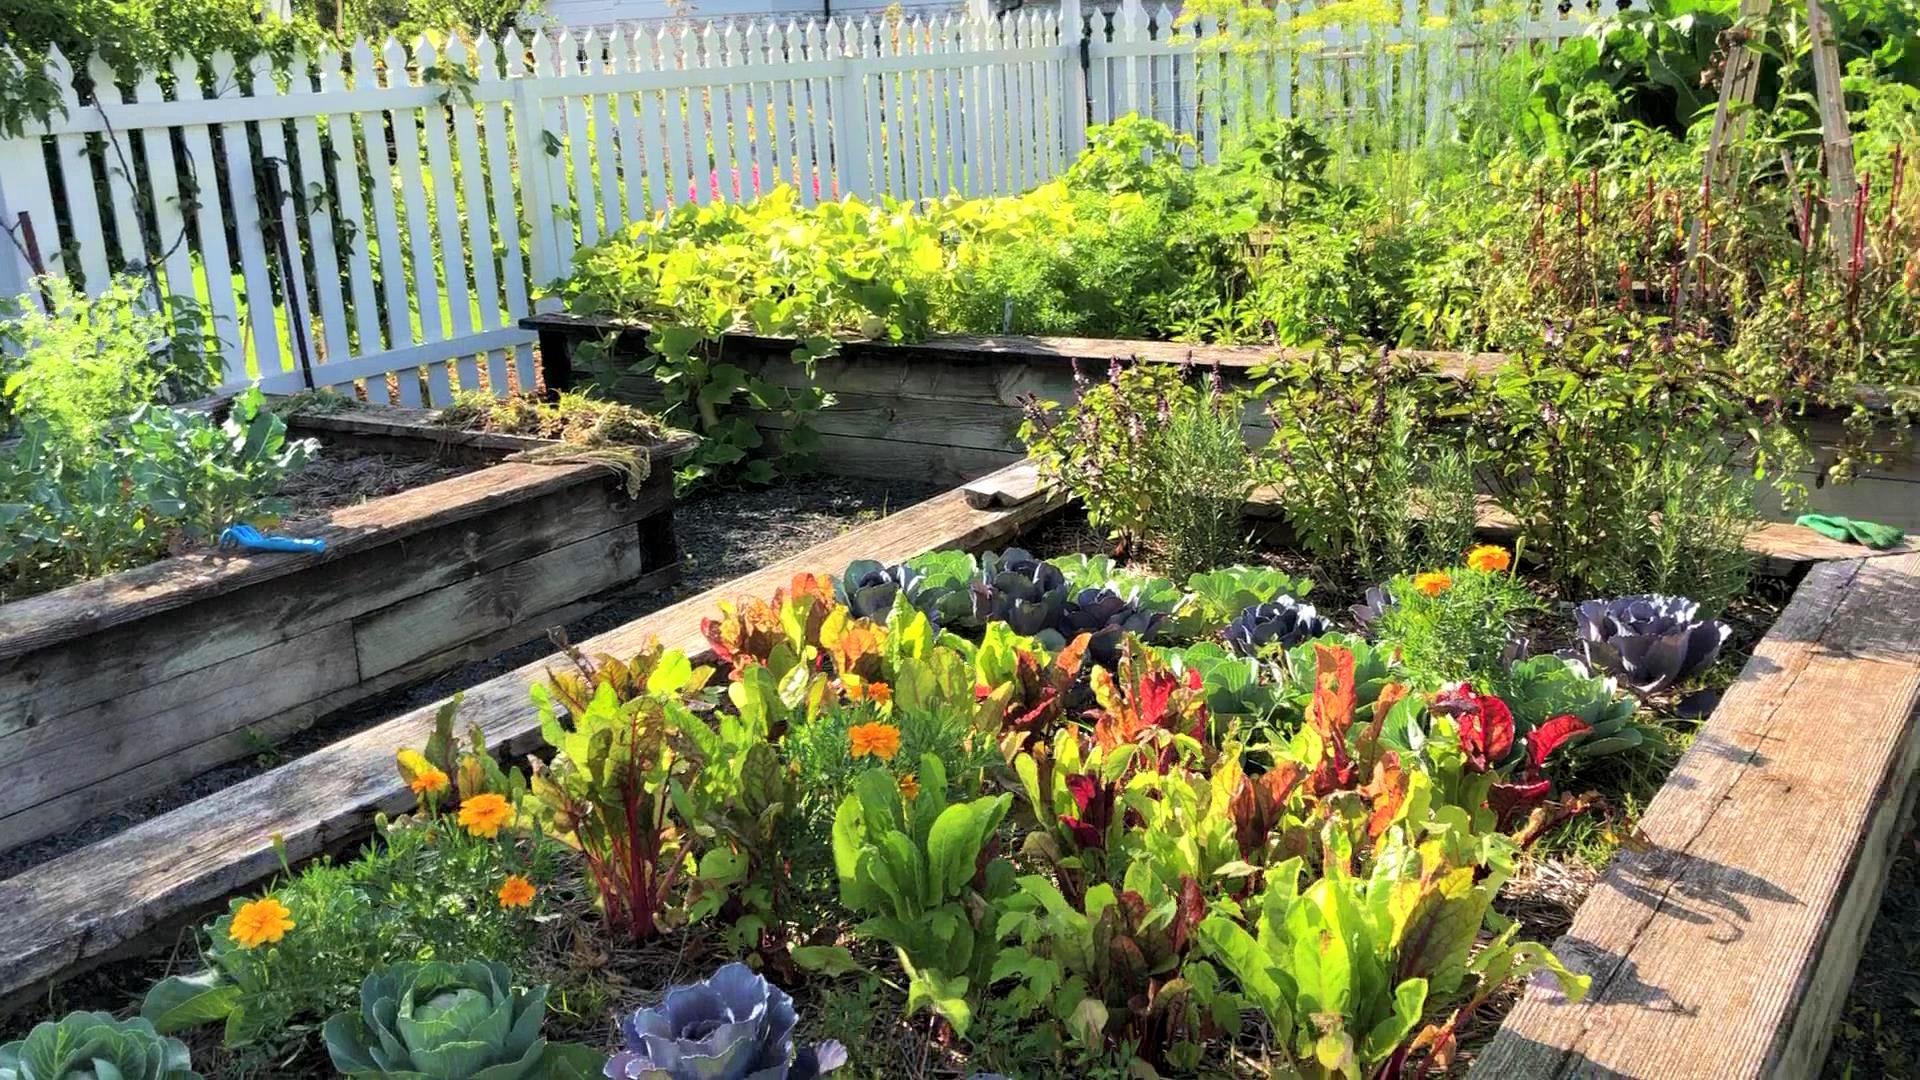 A Little Tour of Our Garden: Video